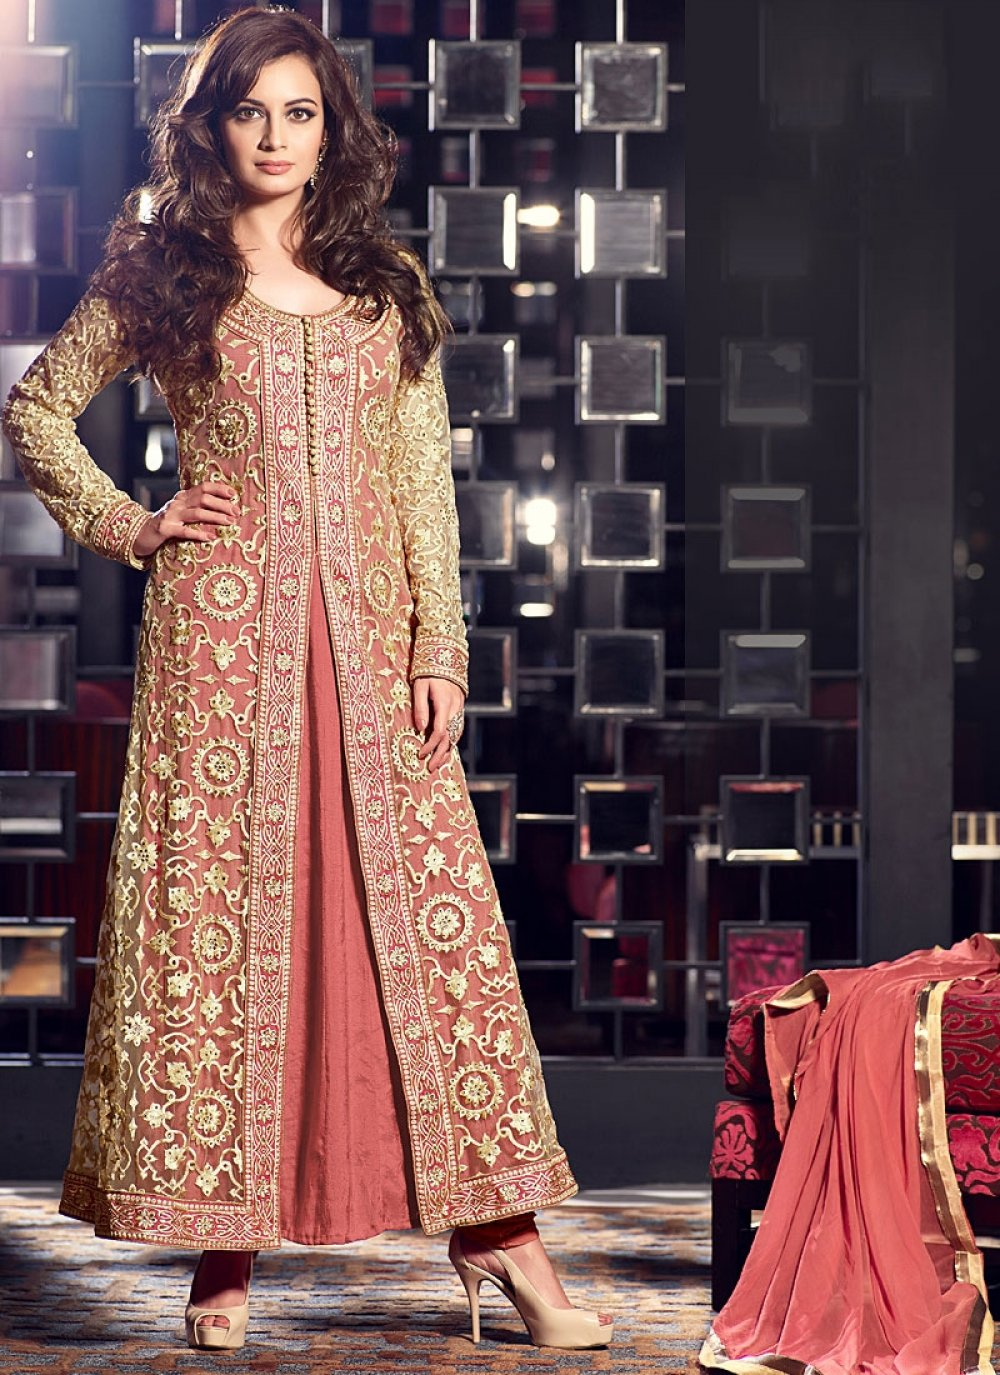 Diya Mirza Brown And Beige Resham Faux Georgette Anarkali Suit